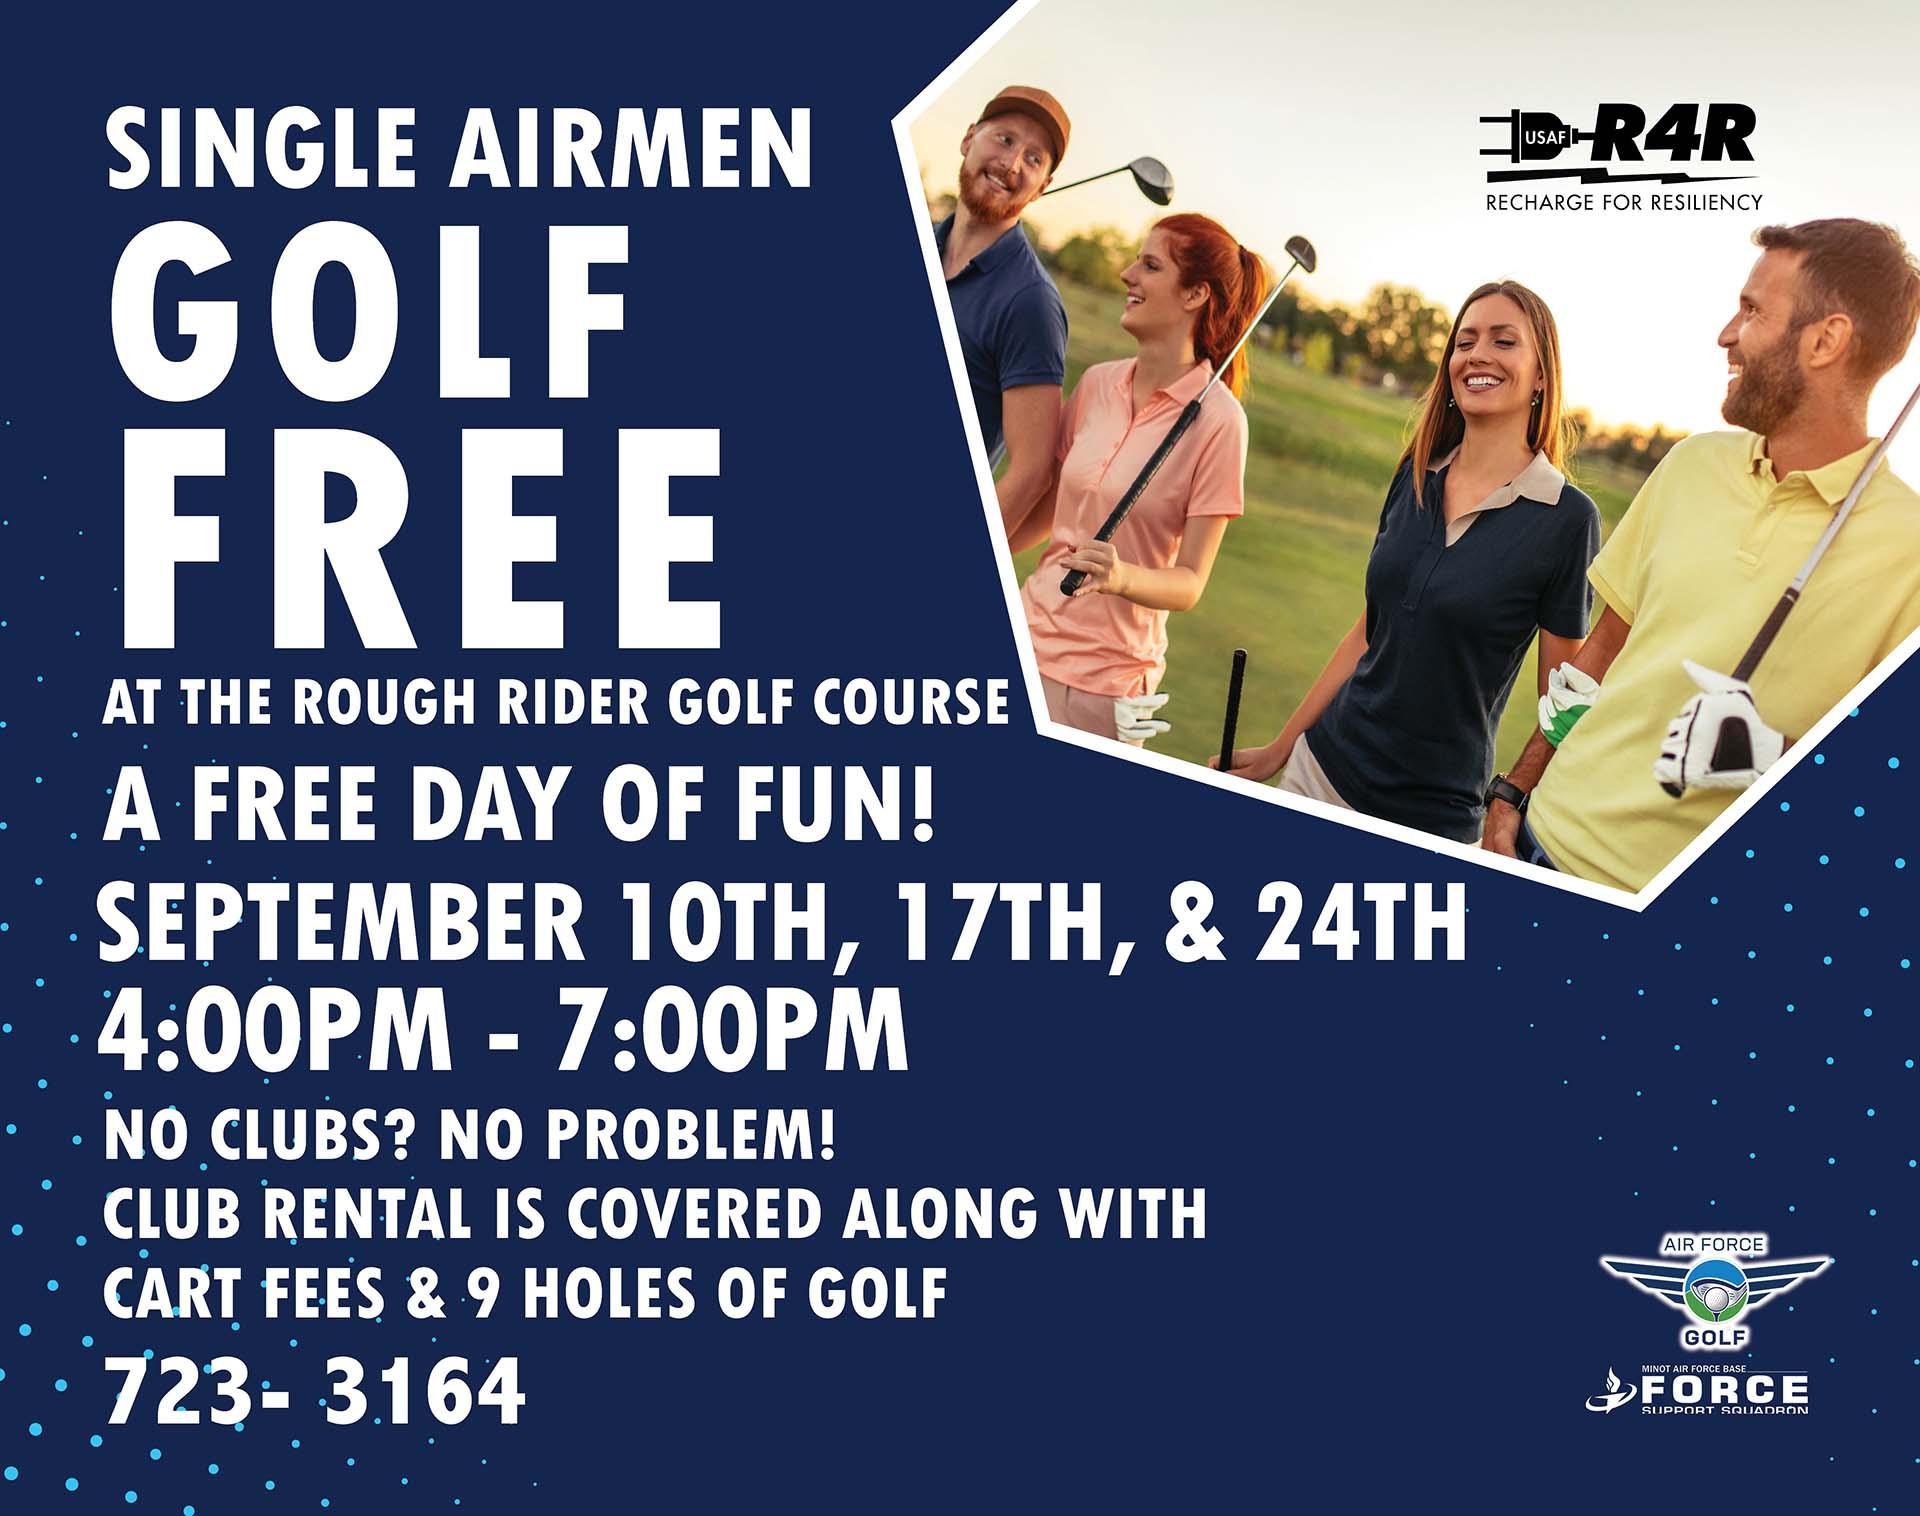 09.10 - 09.24 Single Airmen Golf Free